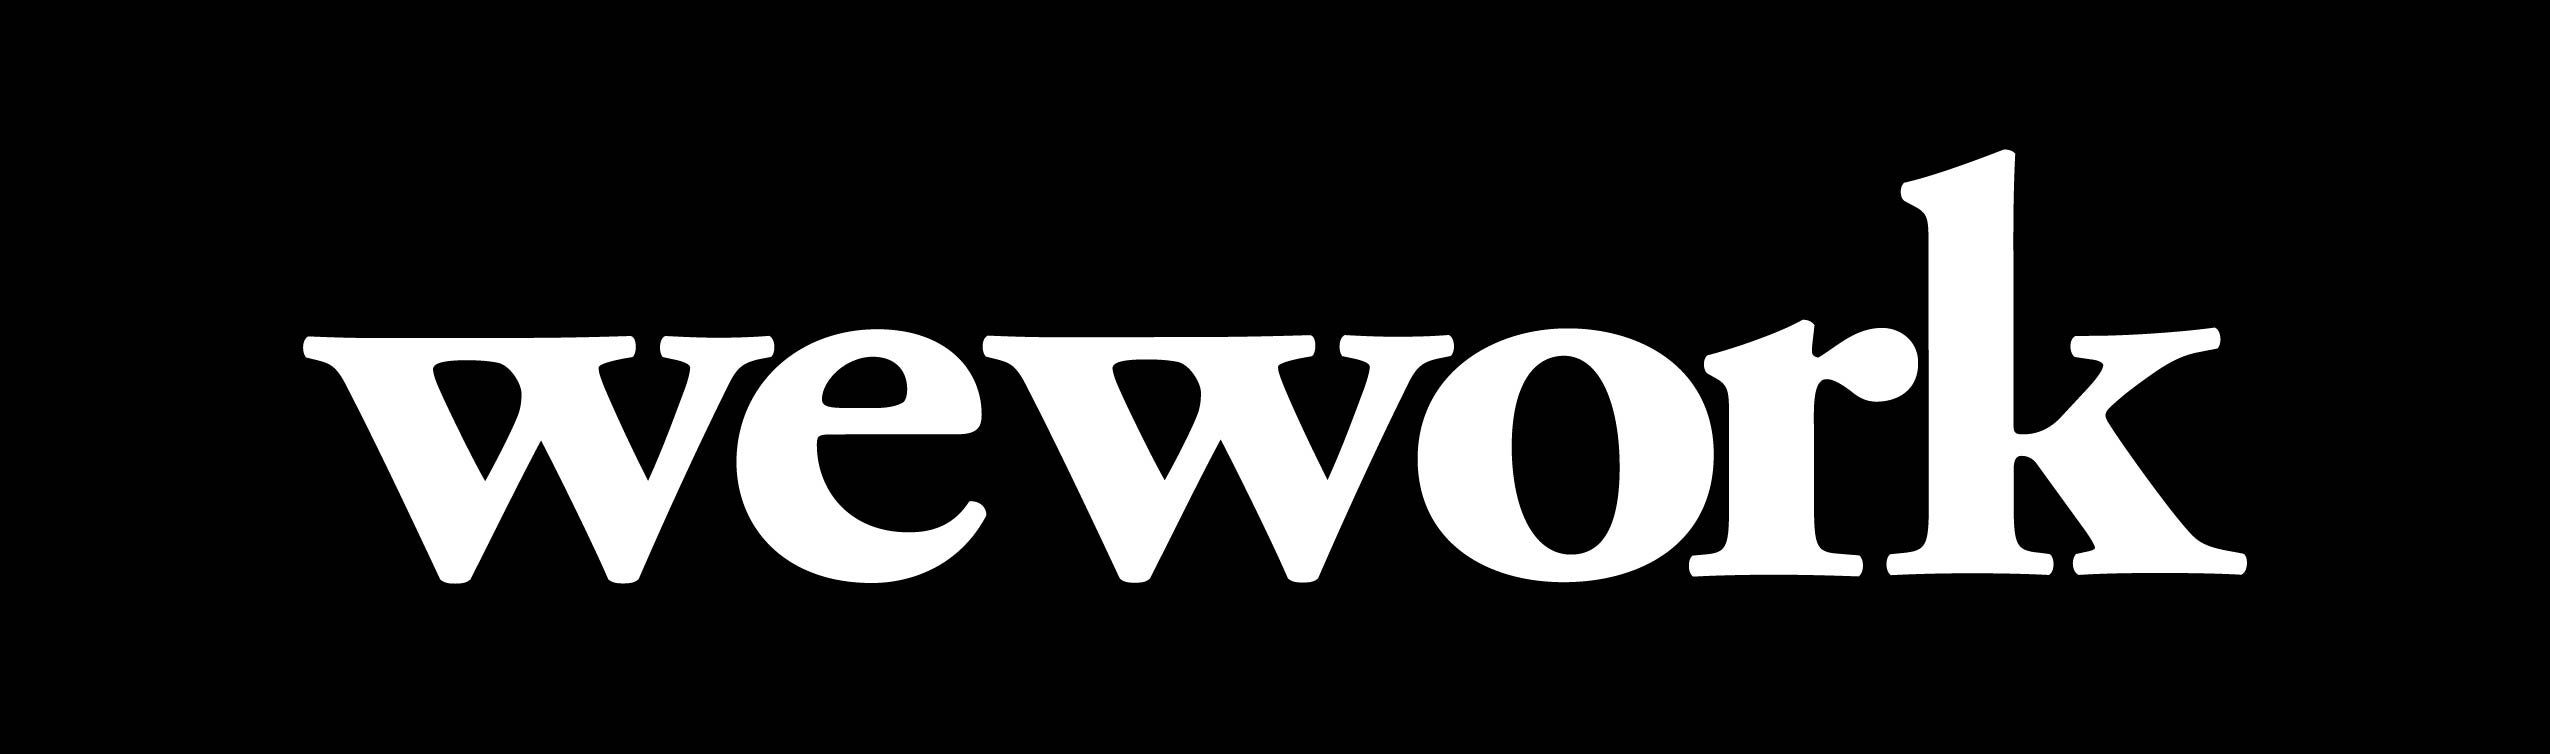 http://idreamnow.org/wp-content/uploads/2012/05/wework-logo_BLACK.jpg